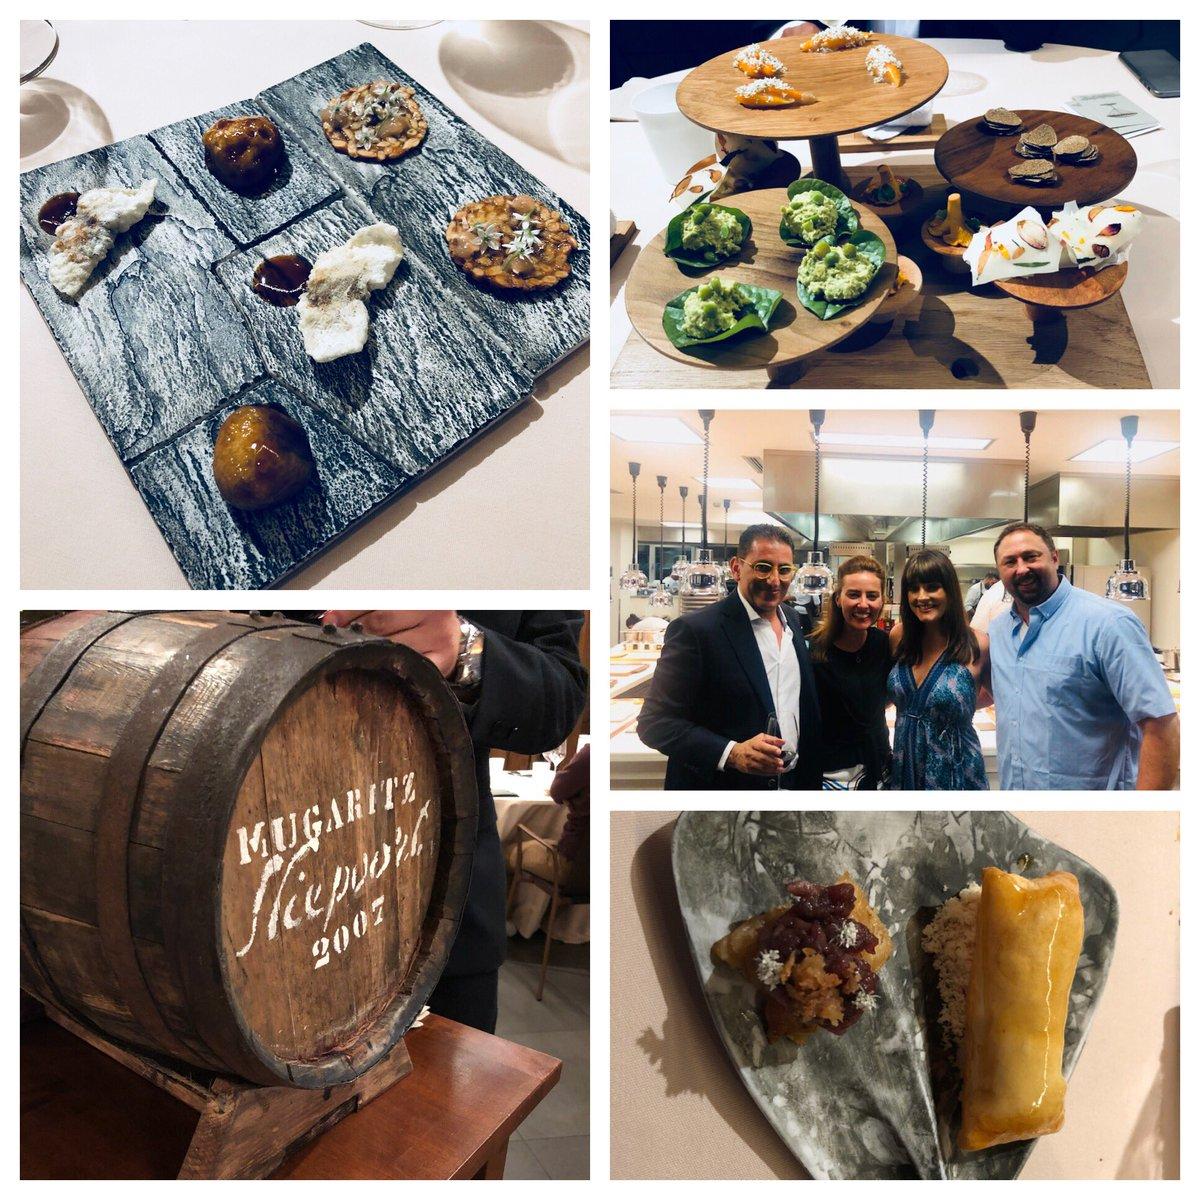 Great food and amazing company at @Mugaritz in San Sebastián! #Spain https://t.co/qgqaoBkrIE